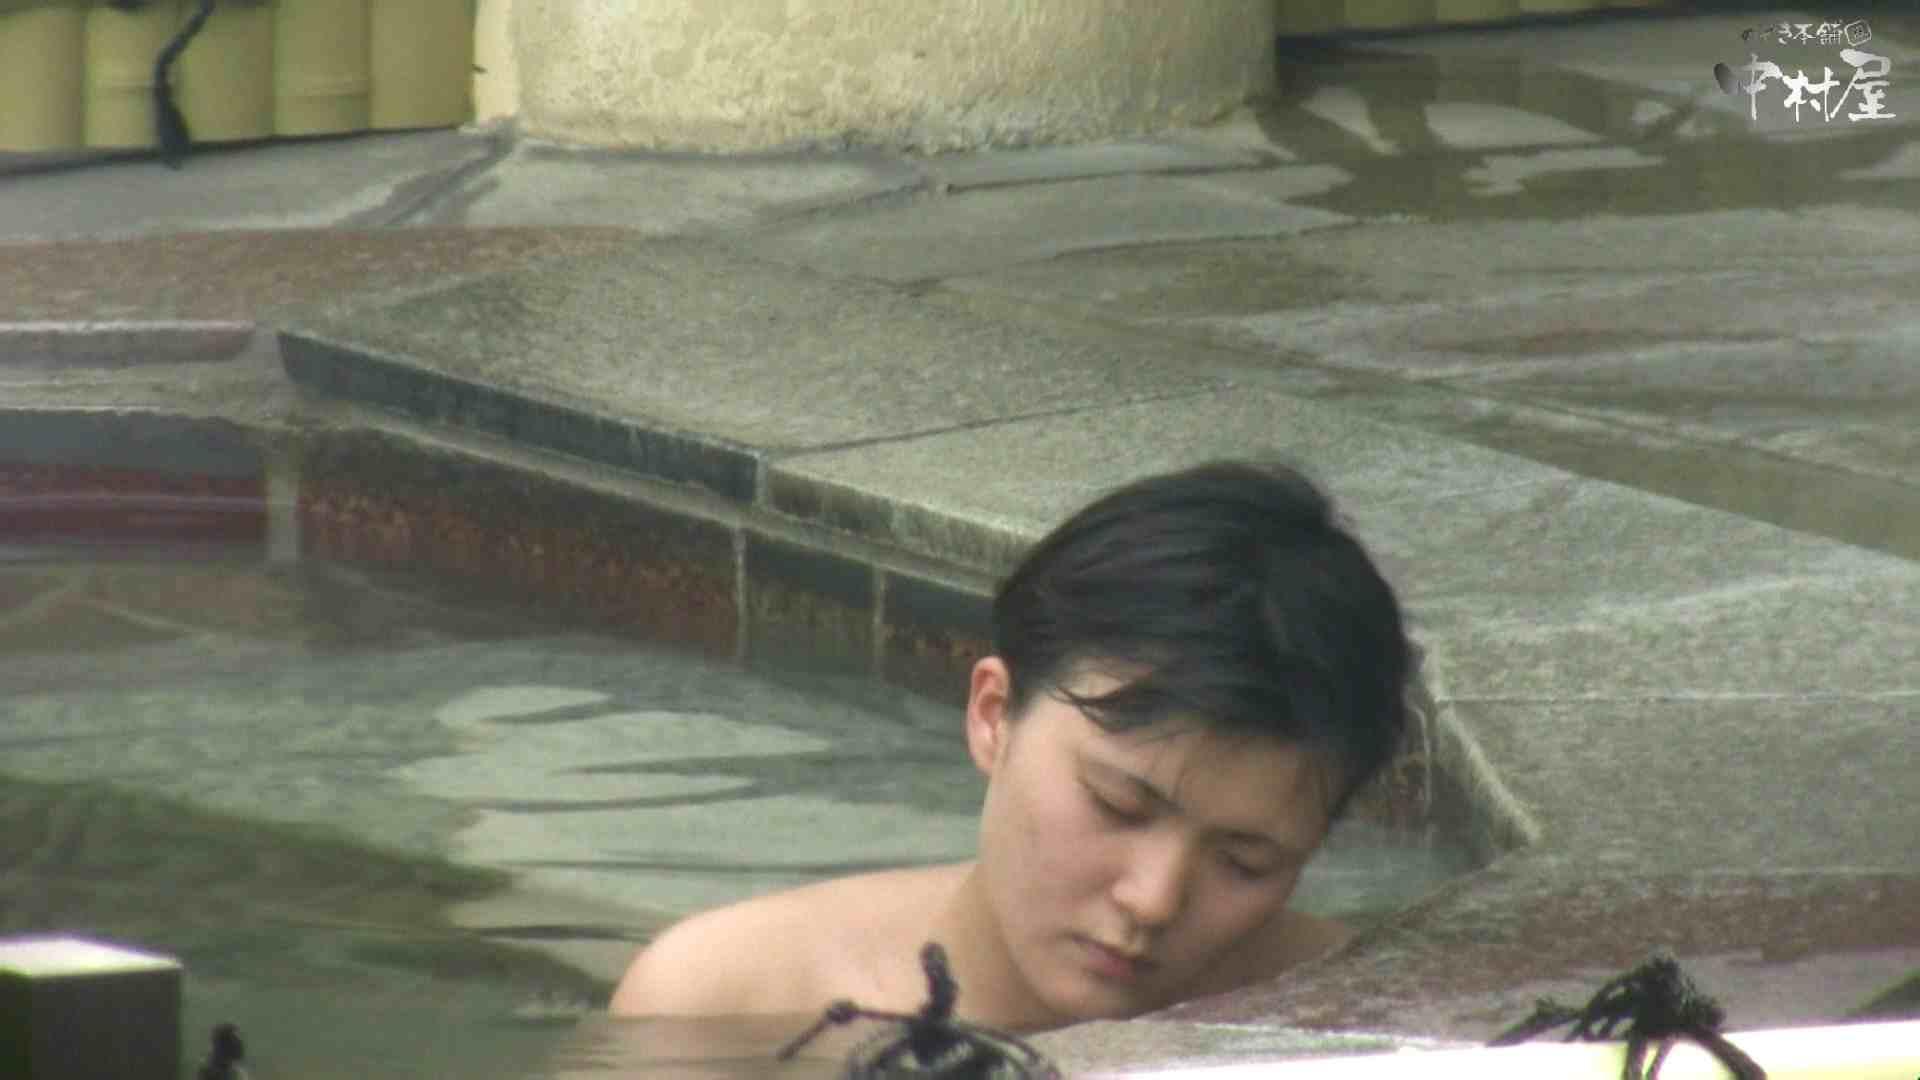 Aquaな露天風呂Vol.894 盗撮シリーズ | 露天風呂編  85PIX 27